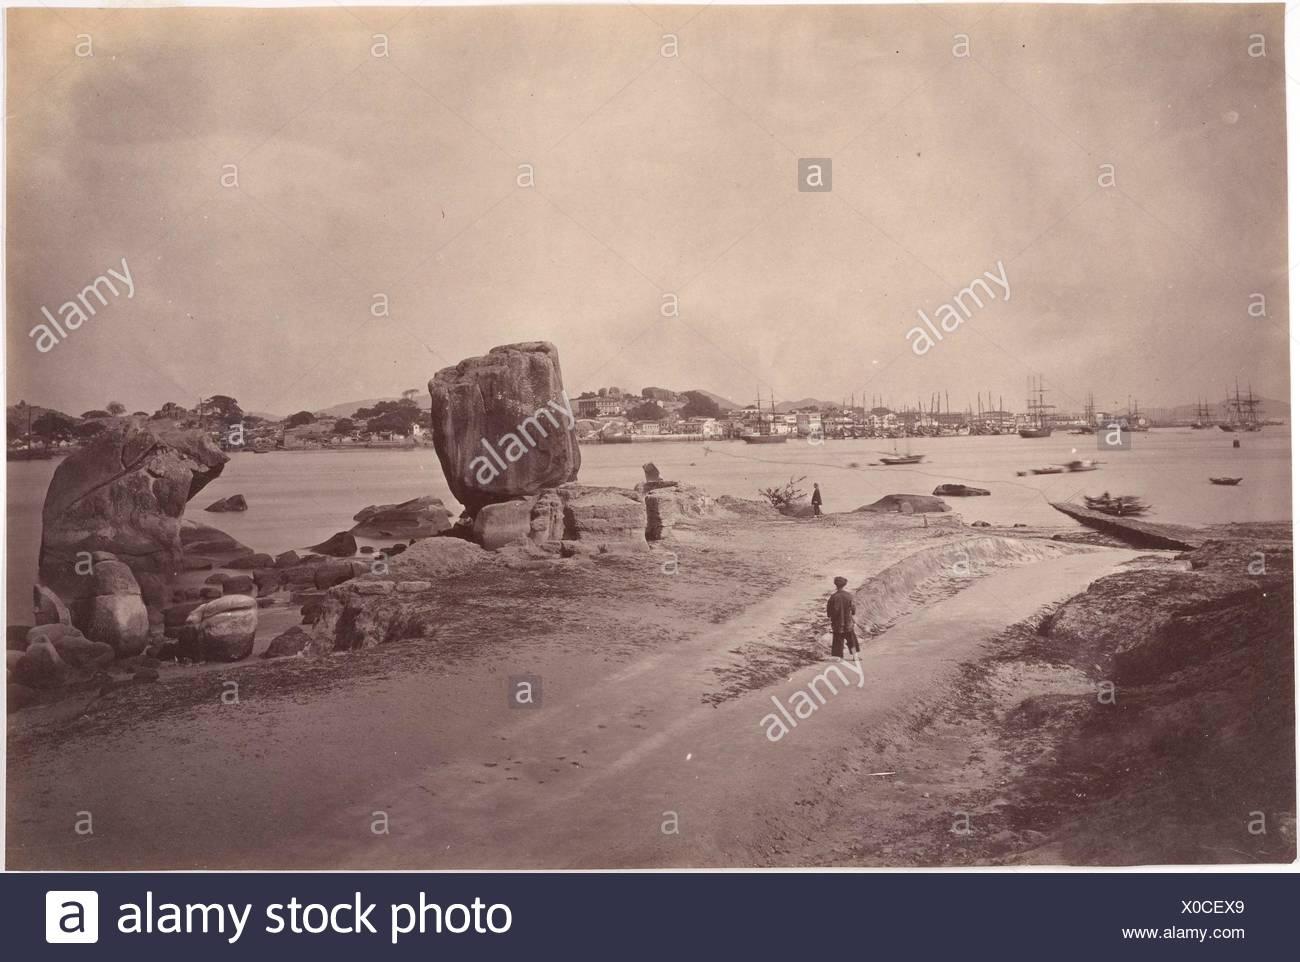 Amoy Harbour. Artist: John Thomson (British, Edinburgh, Scotland 1837-1921 London); Date: ca. 1869; Medium: Albumen silver print from glass negative; - Stock Image